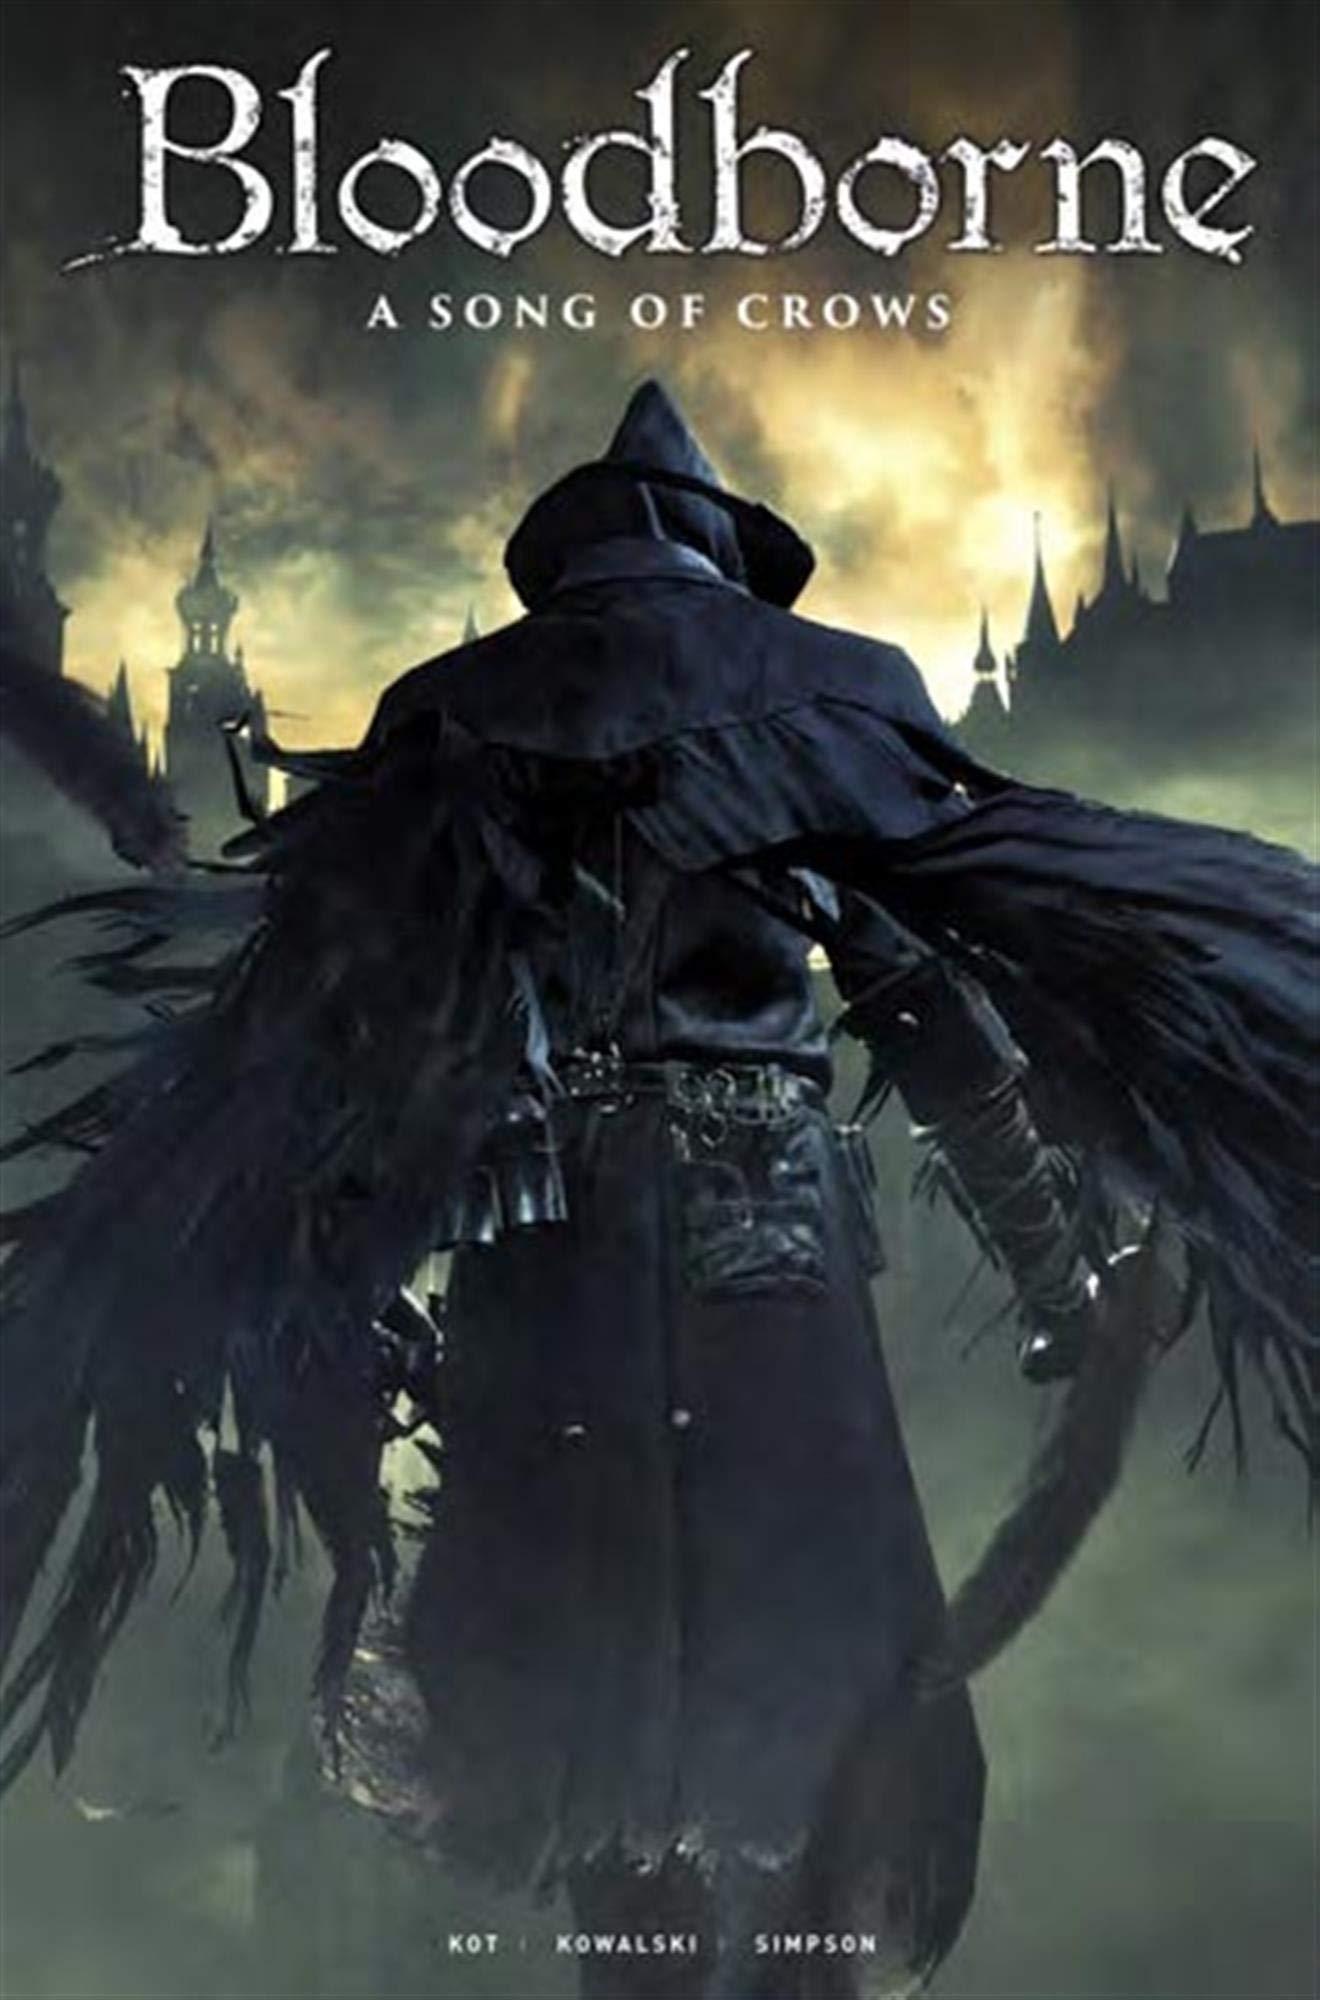 Bloodborne, Tome 3 : Le chant des corbeaux Urban Games: Amazon.es: Kowalski, Piotr, Simpson, Brad, Kot, Ales, Munns, Morgane: Libros en idiomas extranjeros